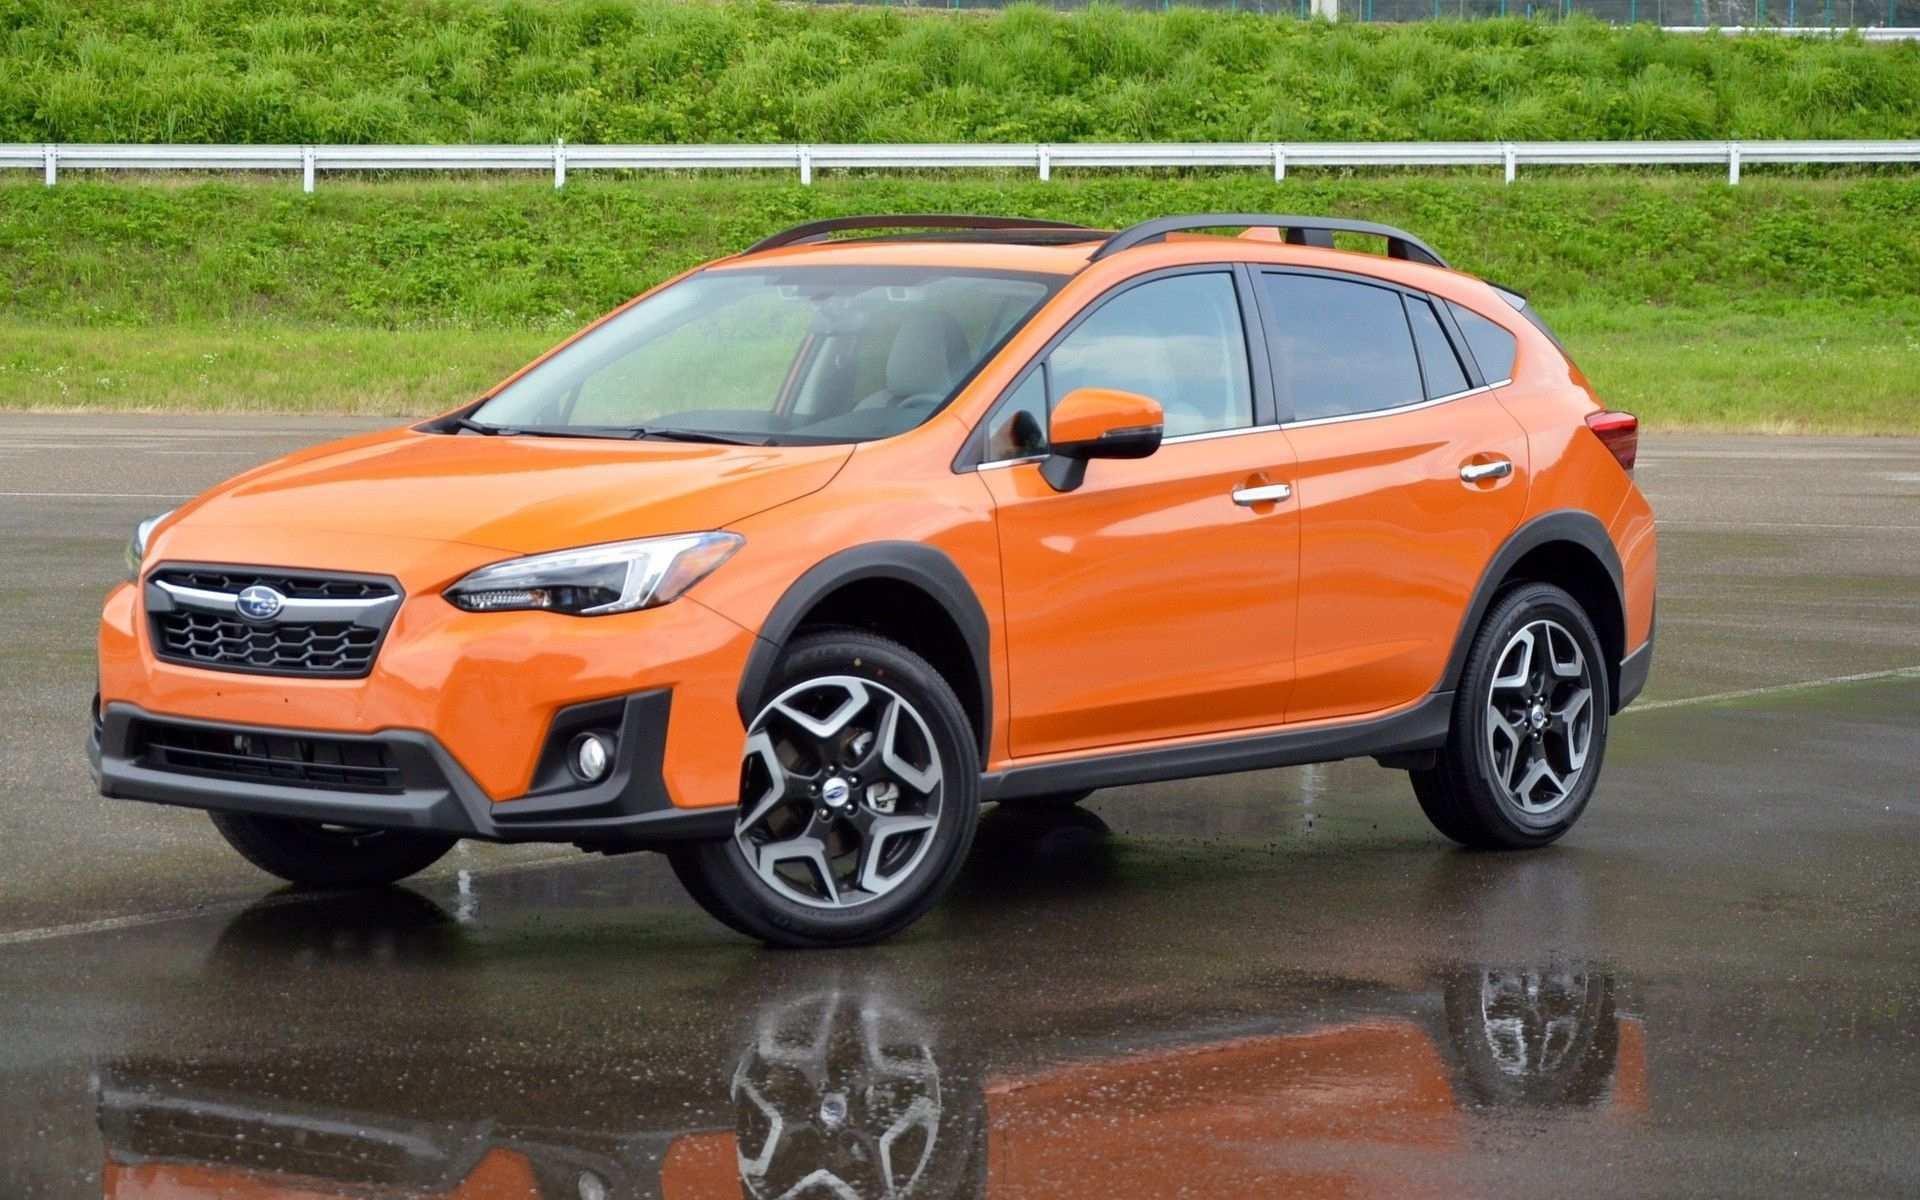 15 Concept of Subaru Xv 2020 Australia Price and Review with Subaru Xv 2020 Australia